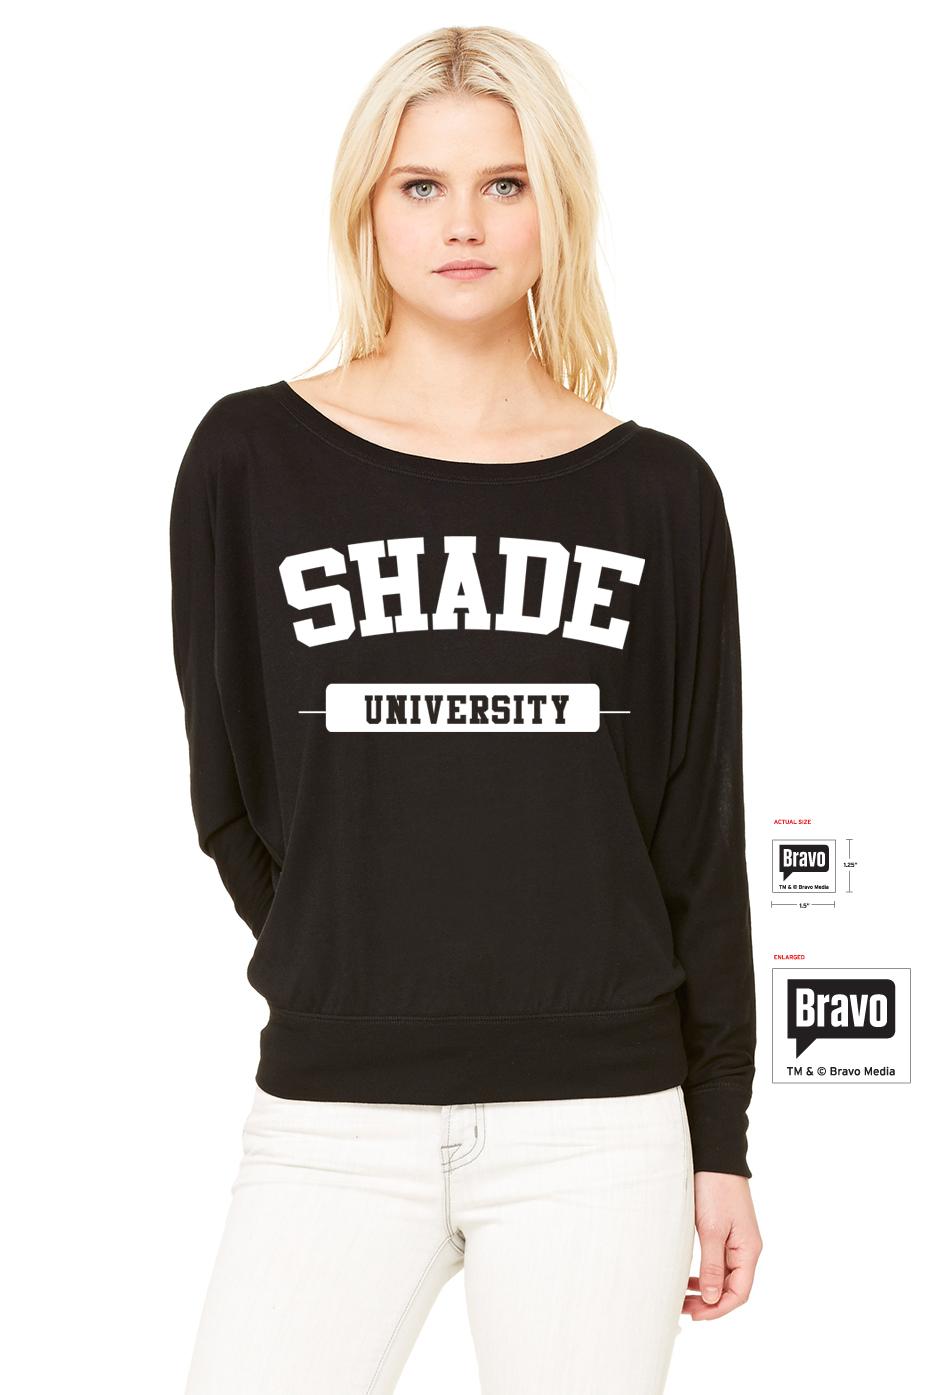 SHADE_UNIVERSITY.jpg